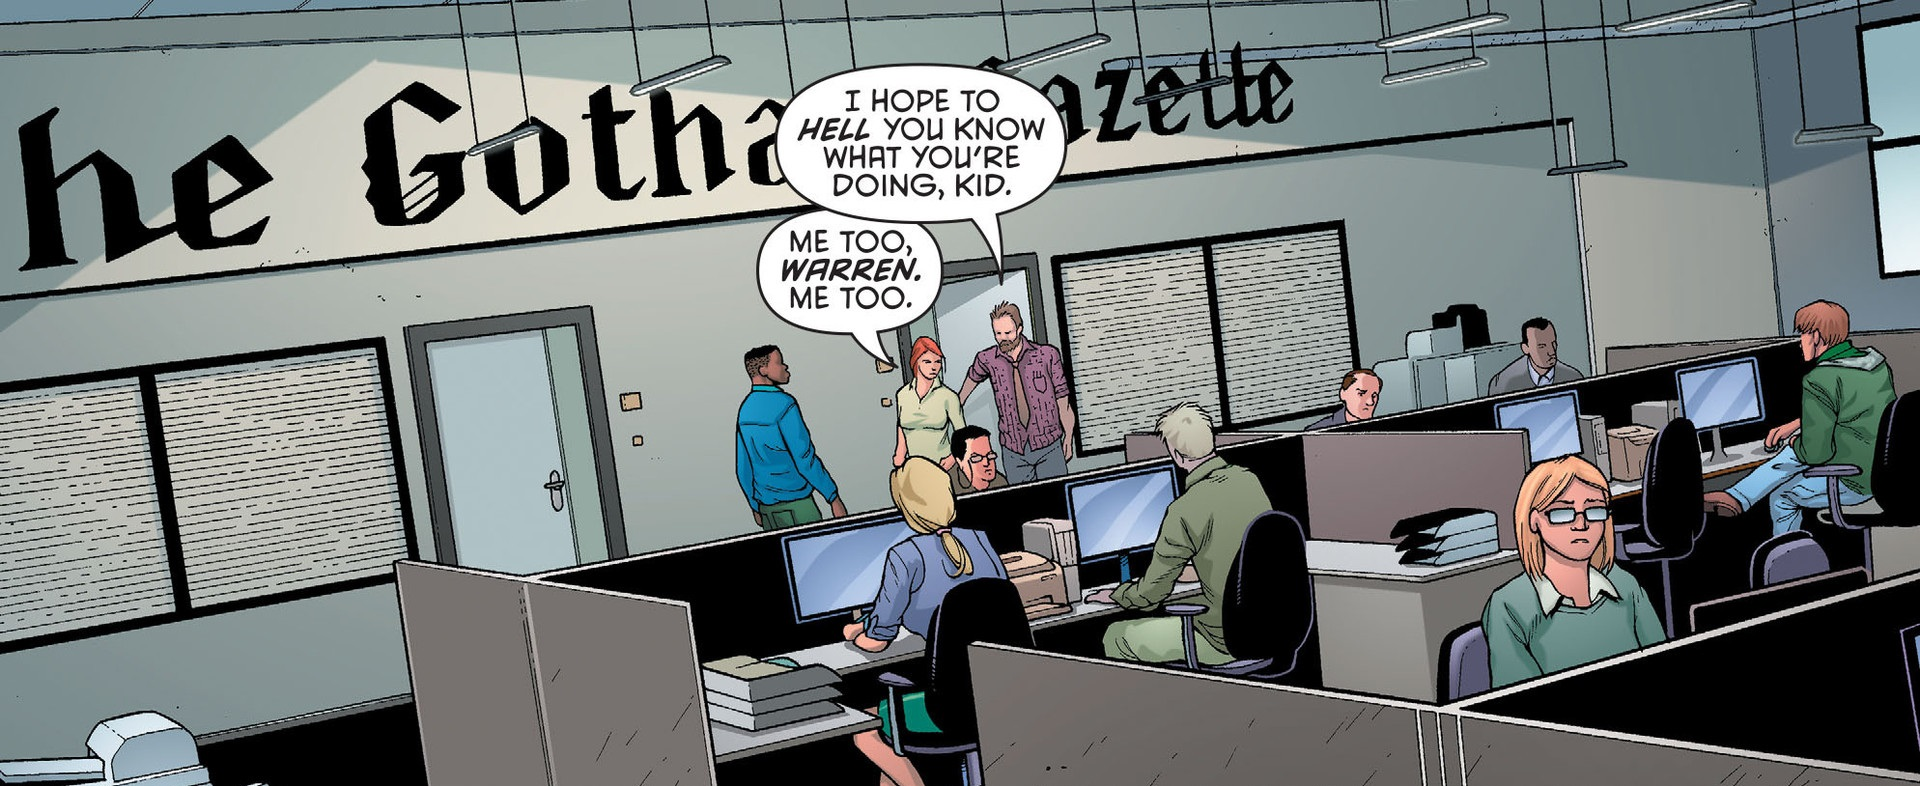 The Headlines of The Gotham Gazette During The Dark Knight